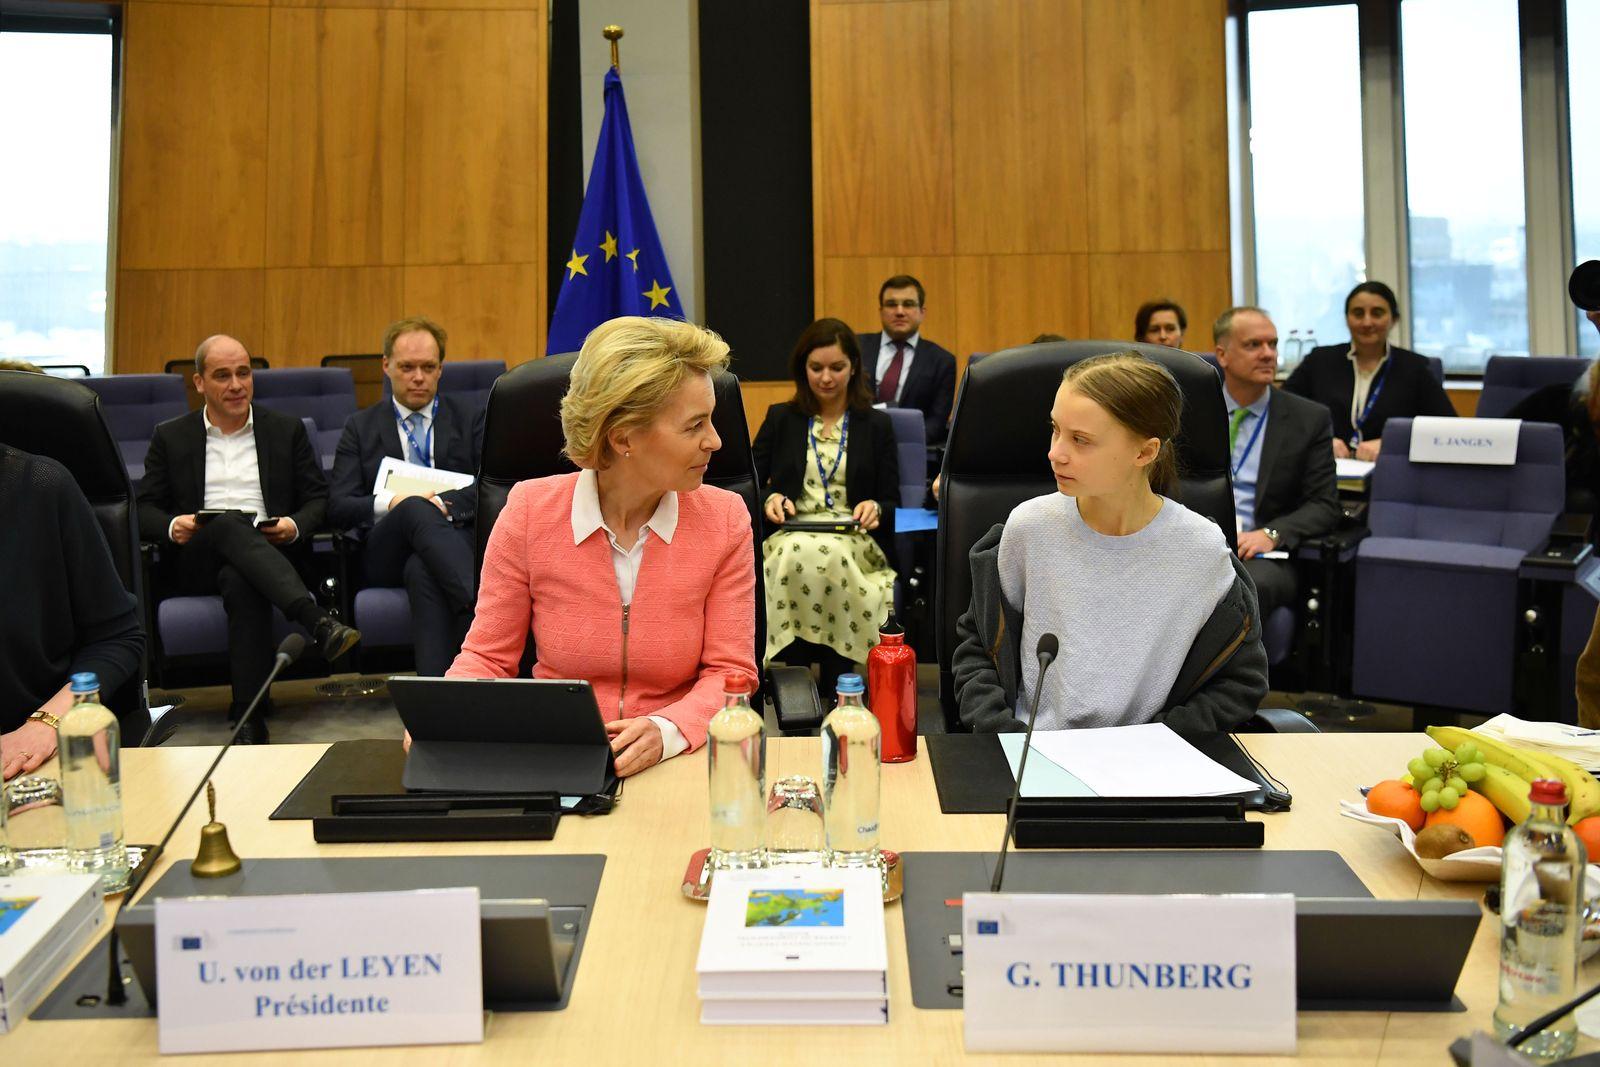 Greta Thunberg Meets European Commission President To Announce EU Climate Deal